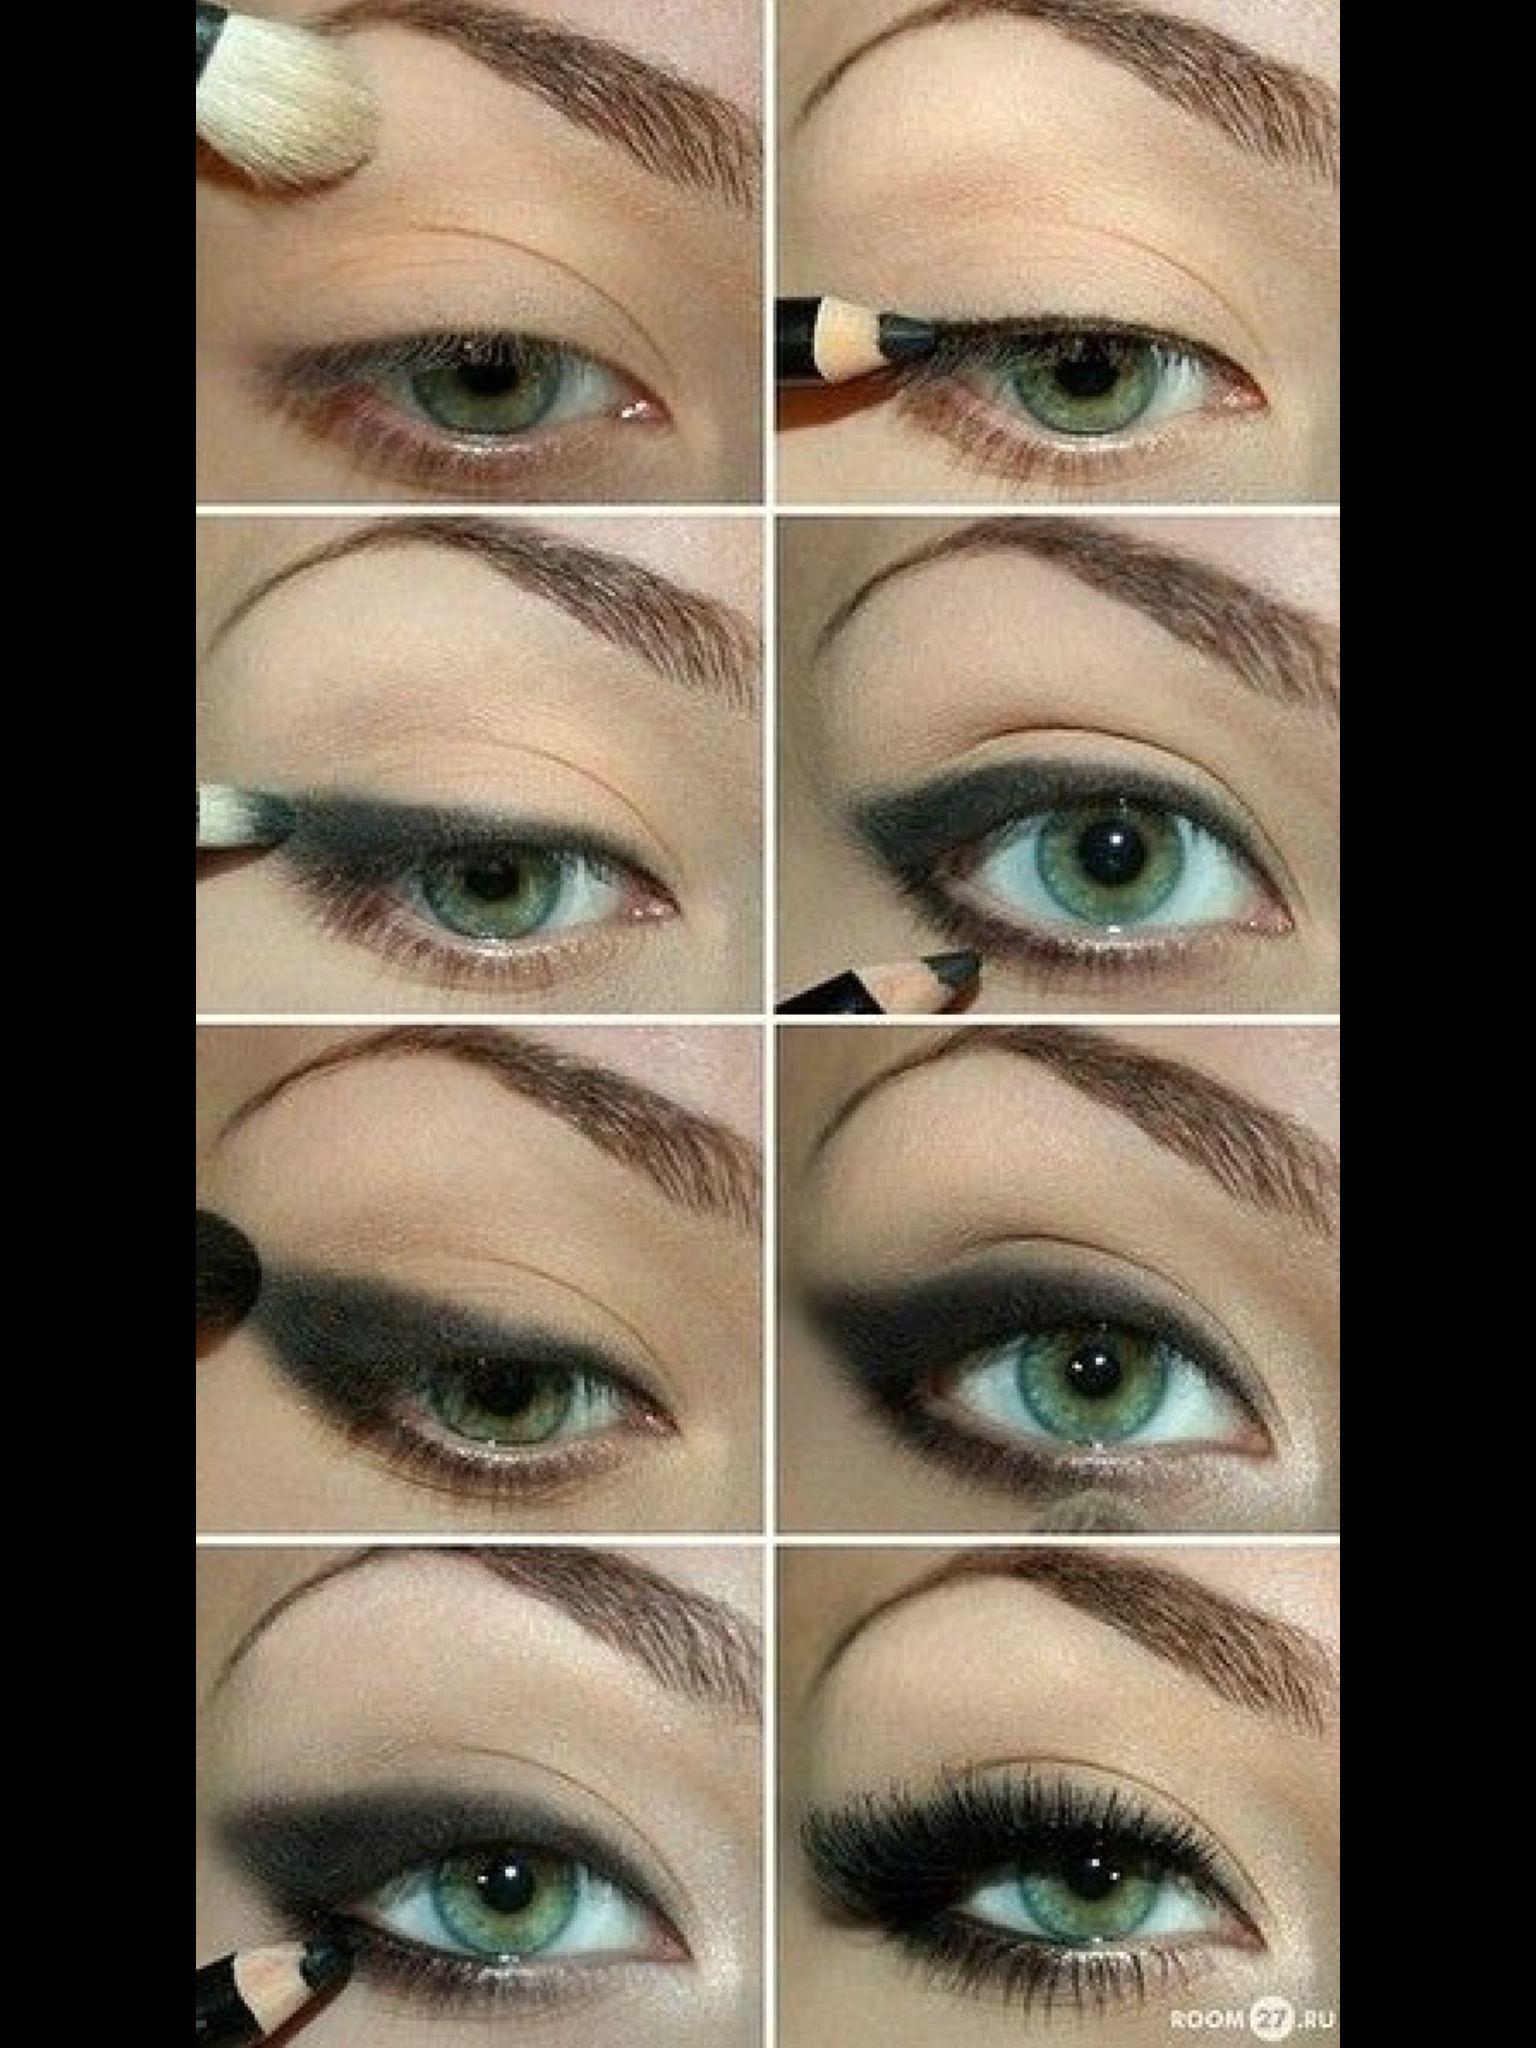 Dark emo makeup Eye Makeup Pinterest Emo makeup, Emo